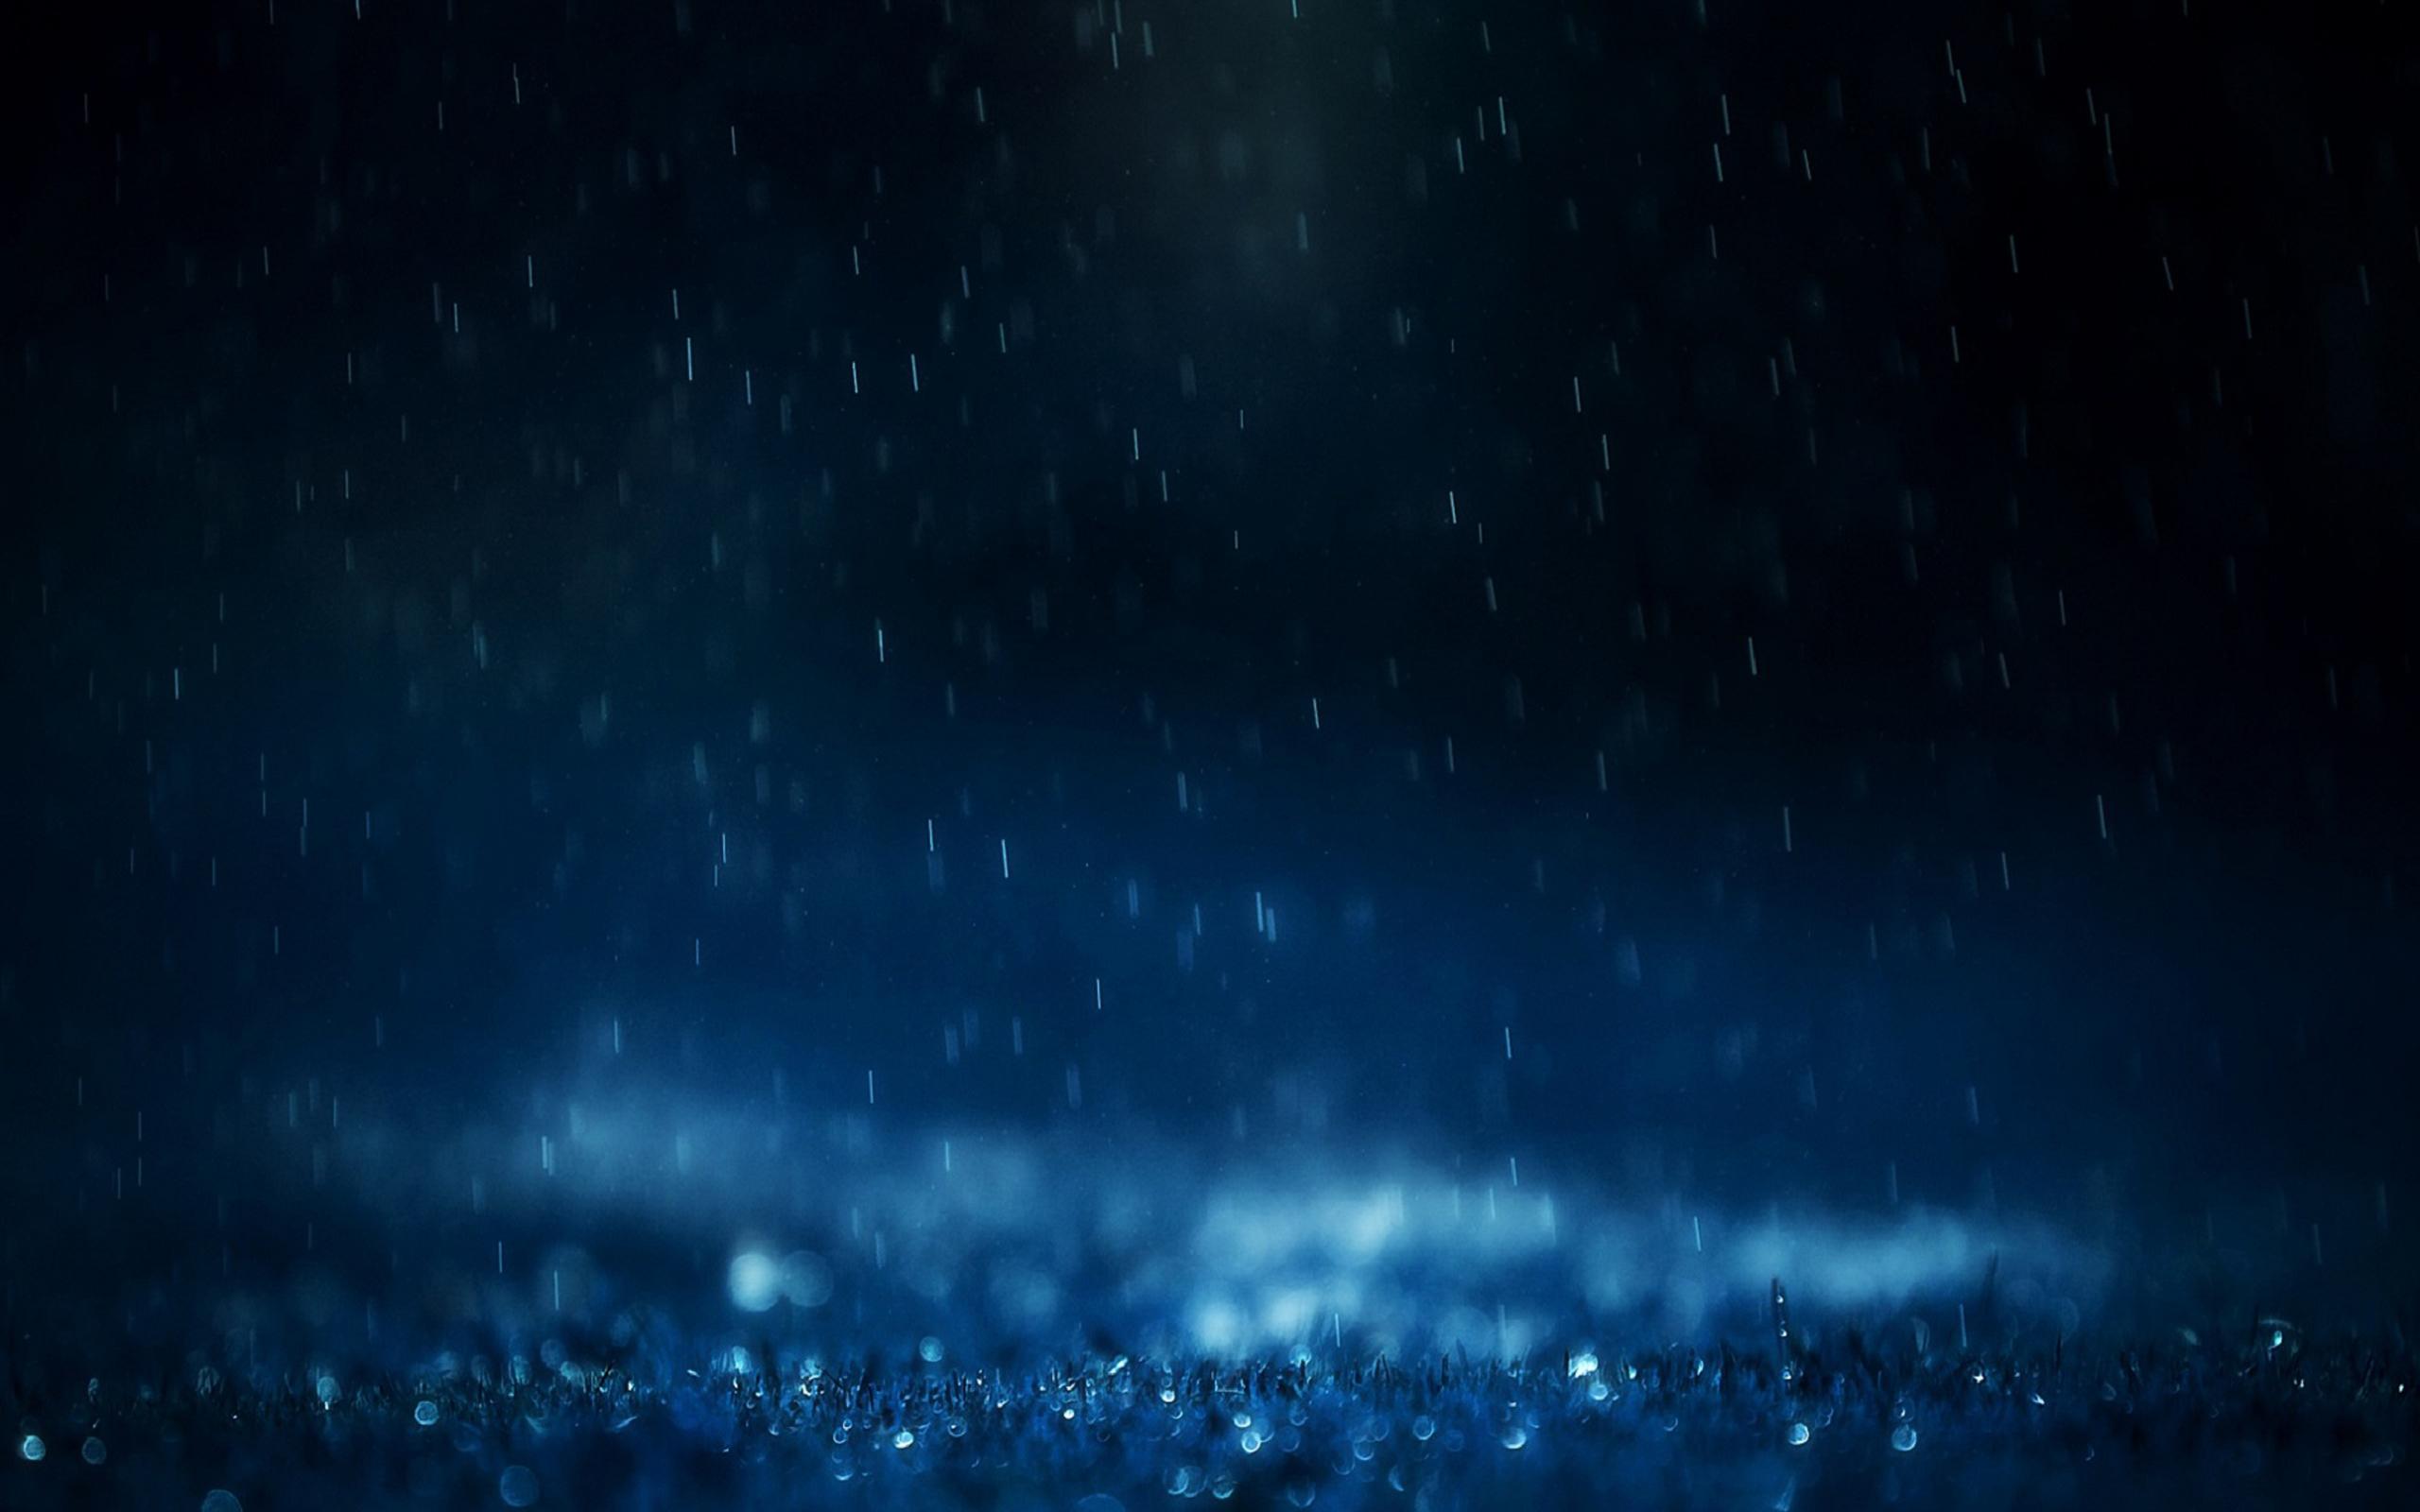 rain drops pictures hd